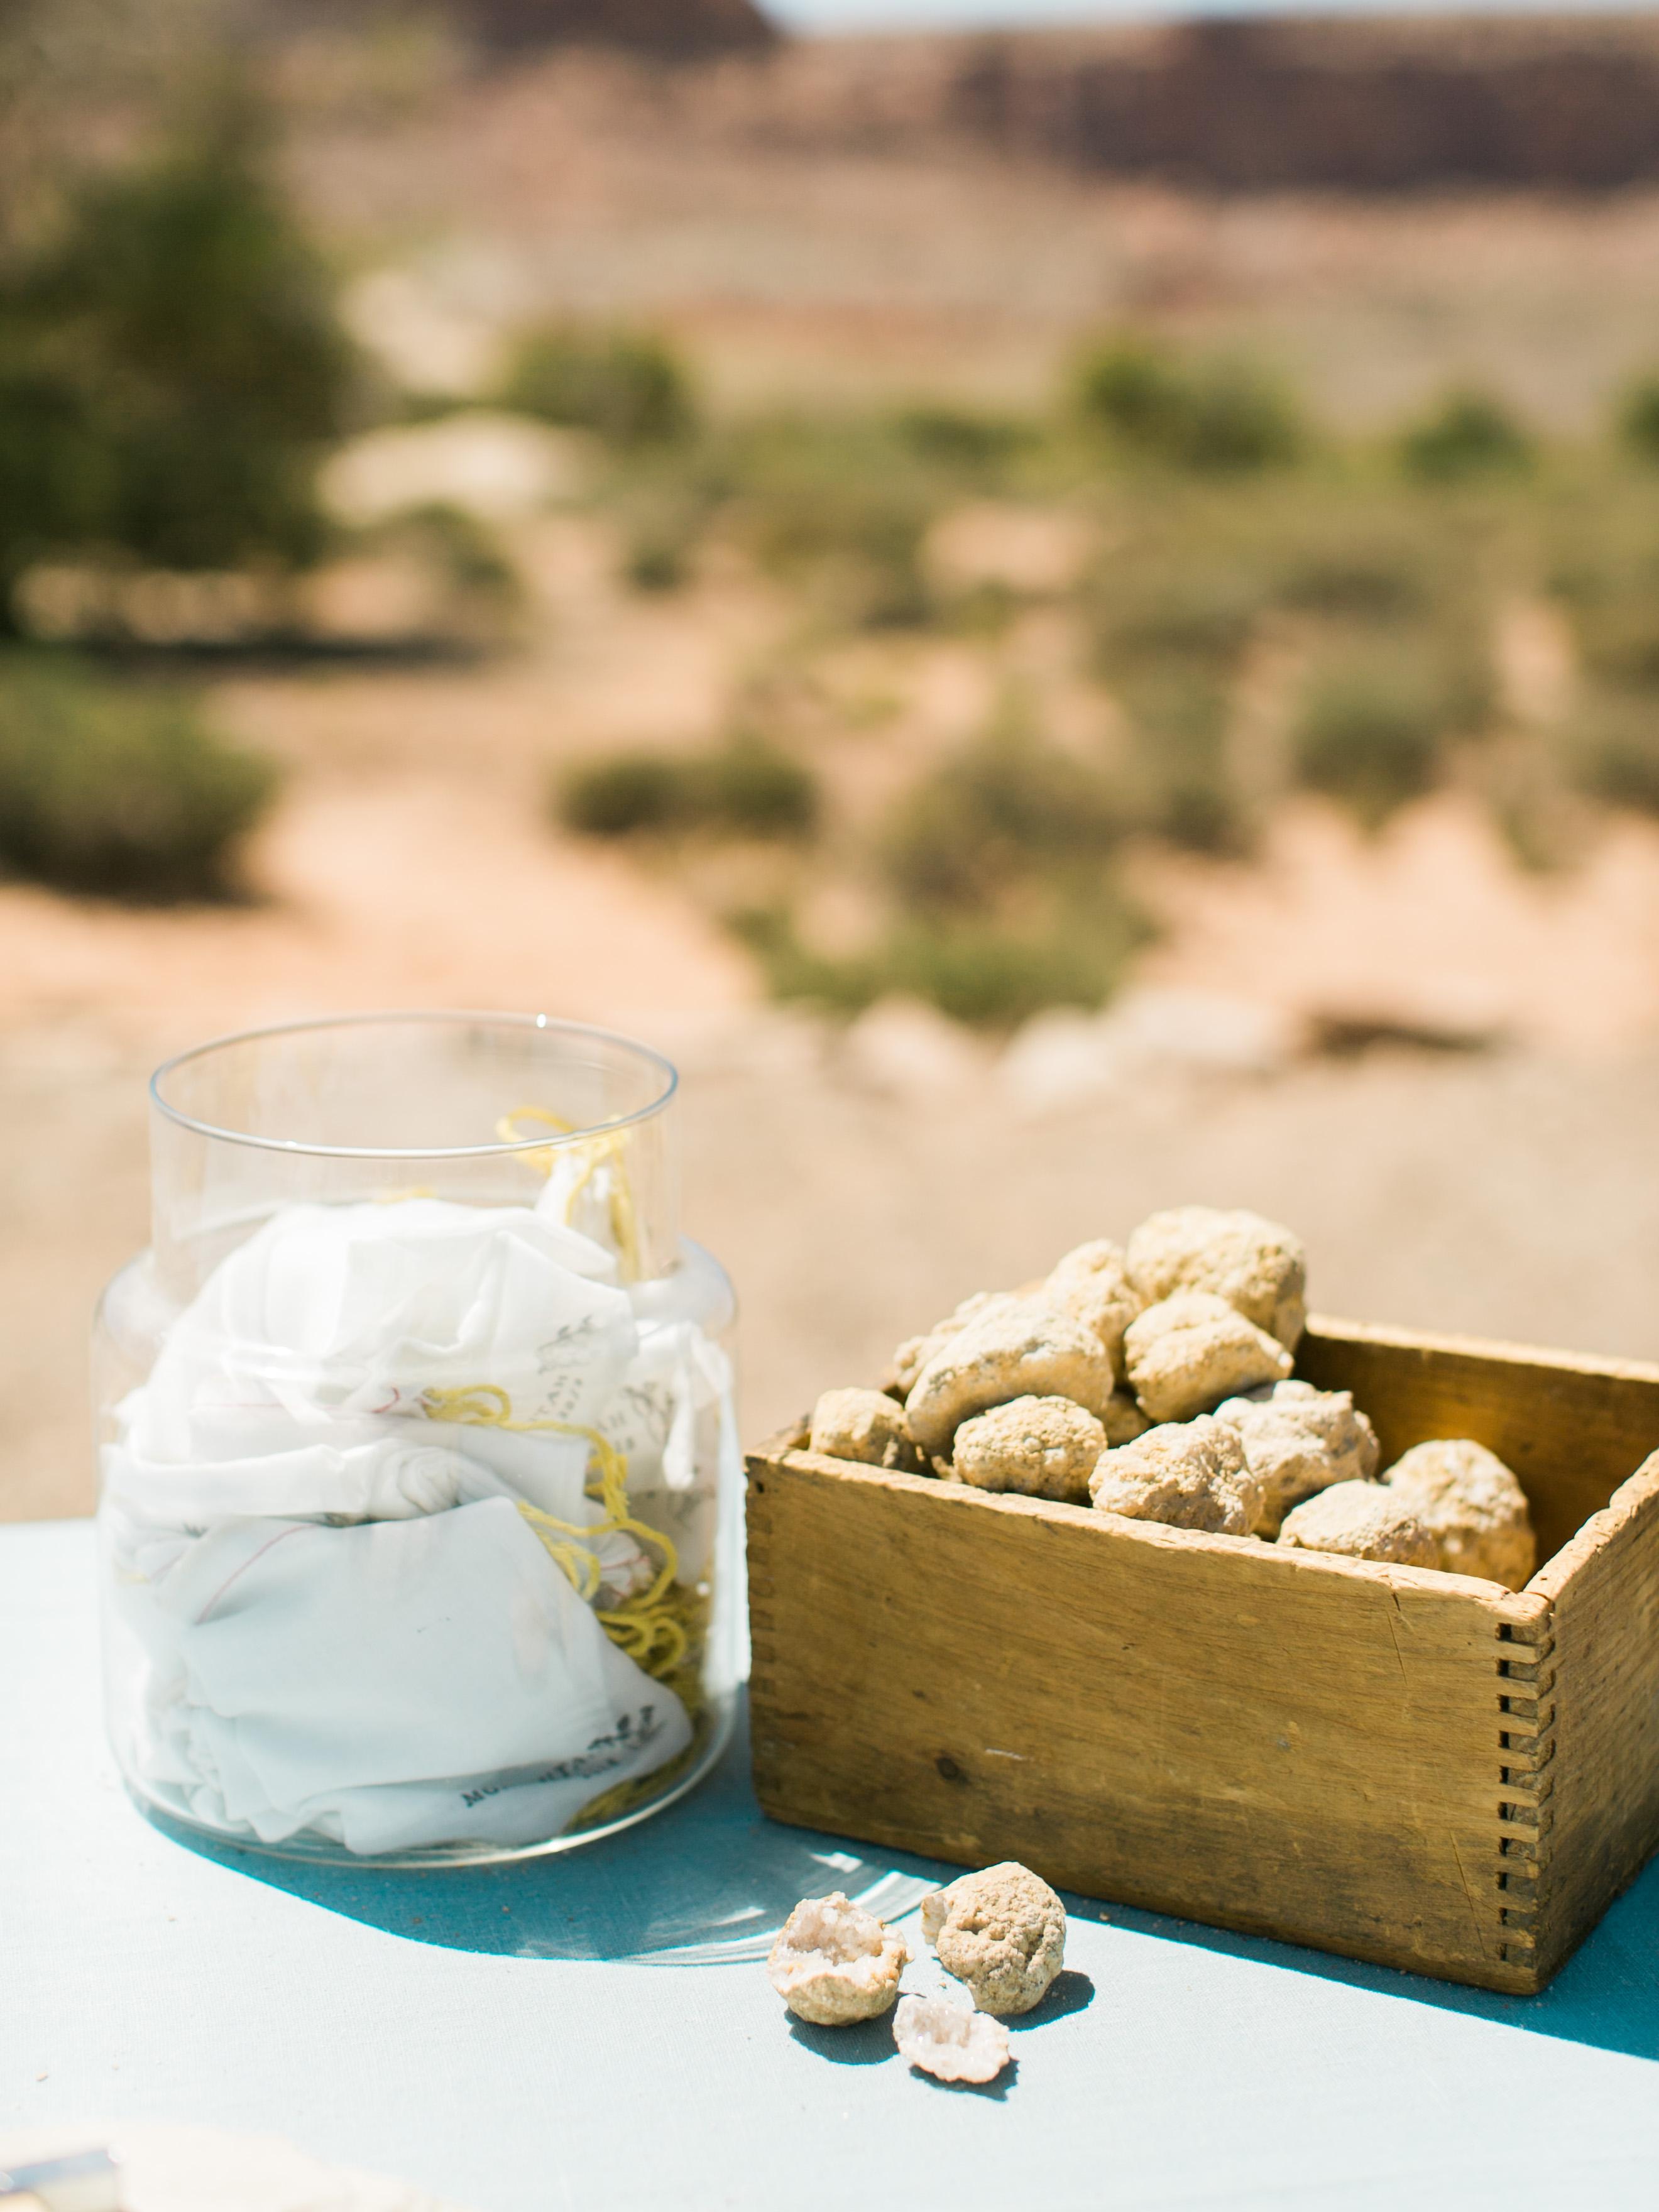 jeanette david wedding desert geodes in box by jar of paper